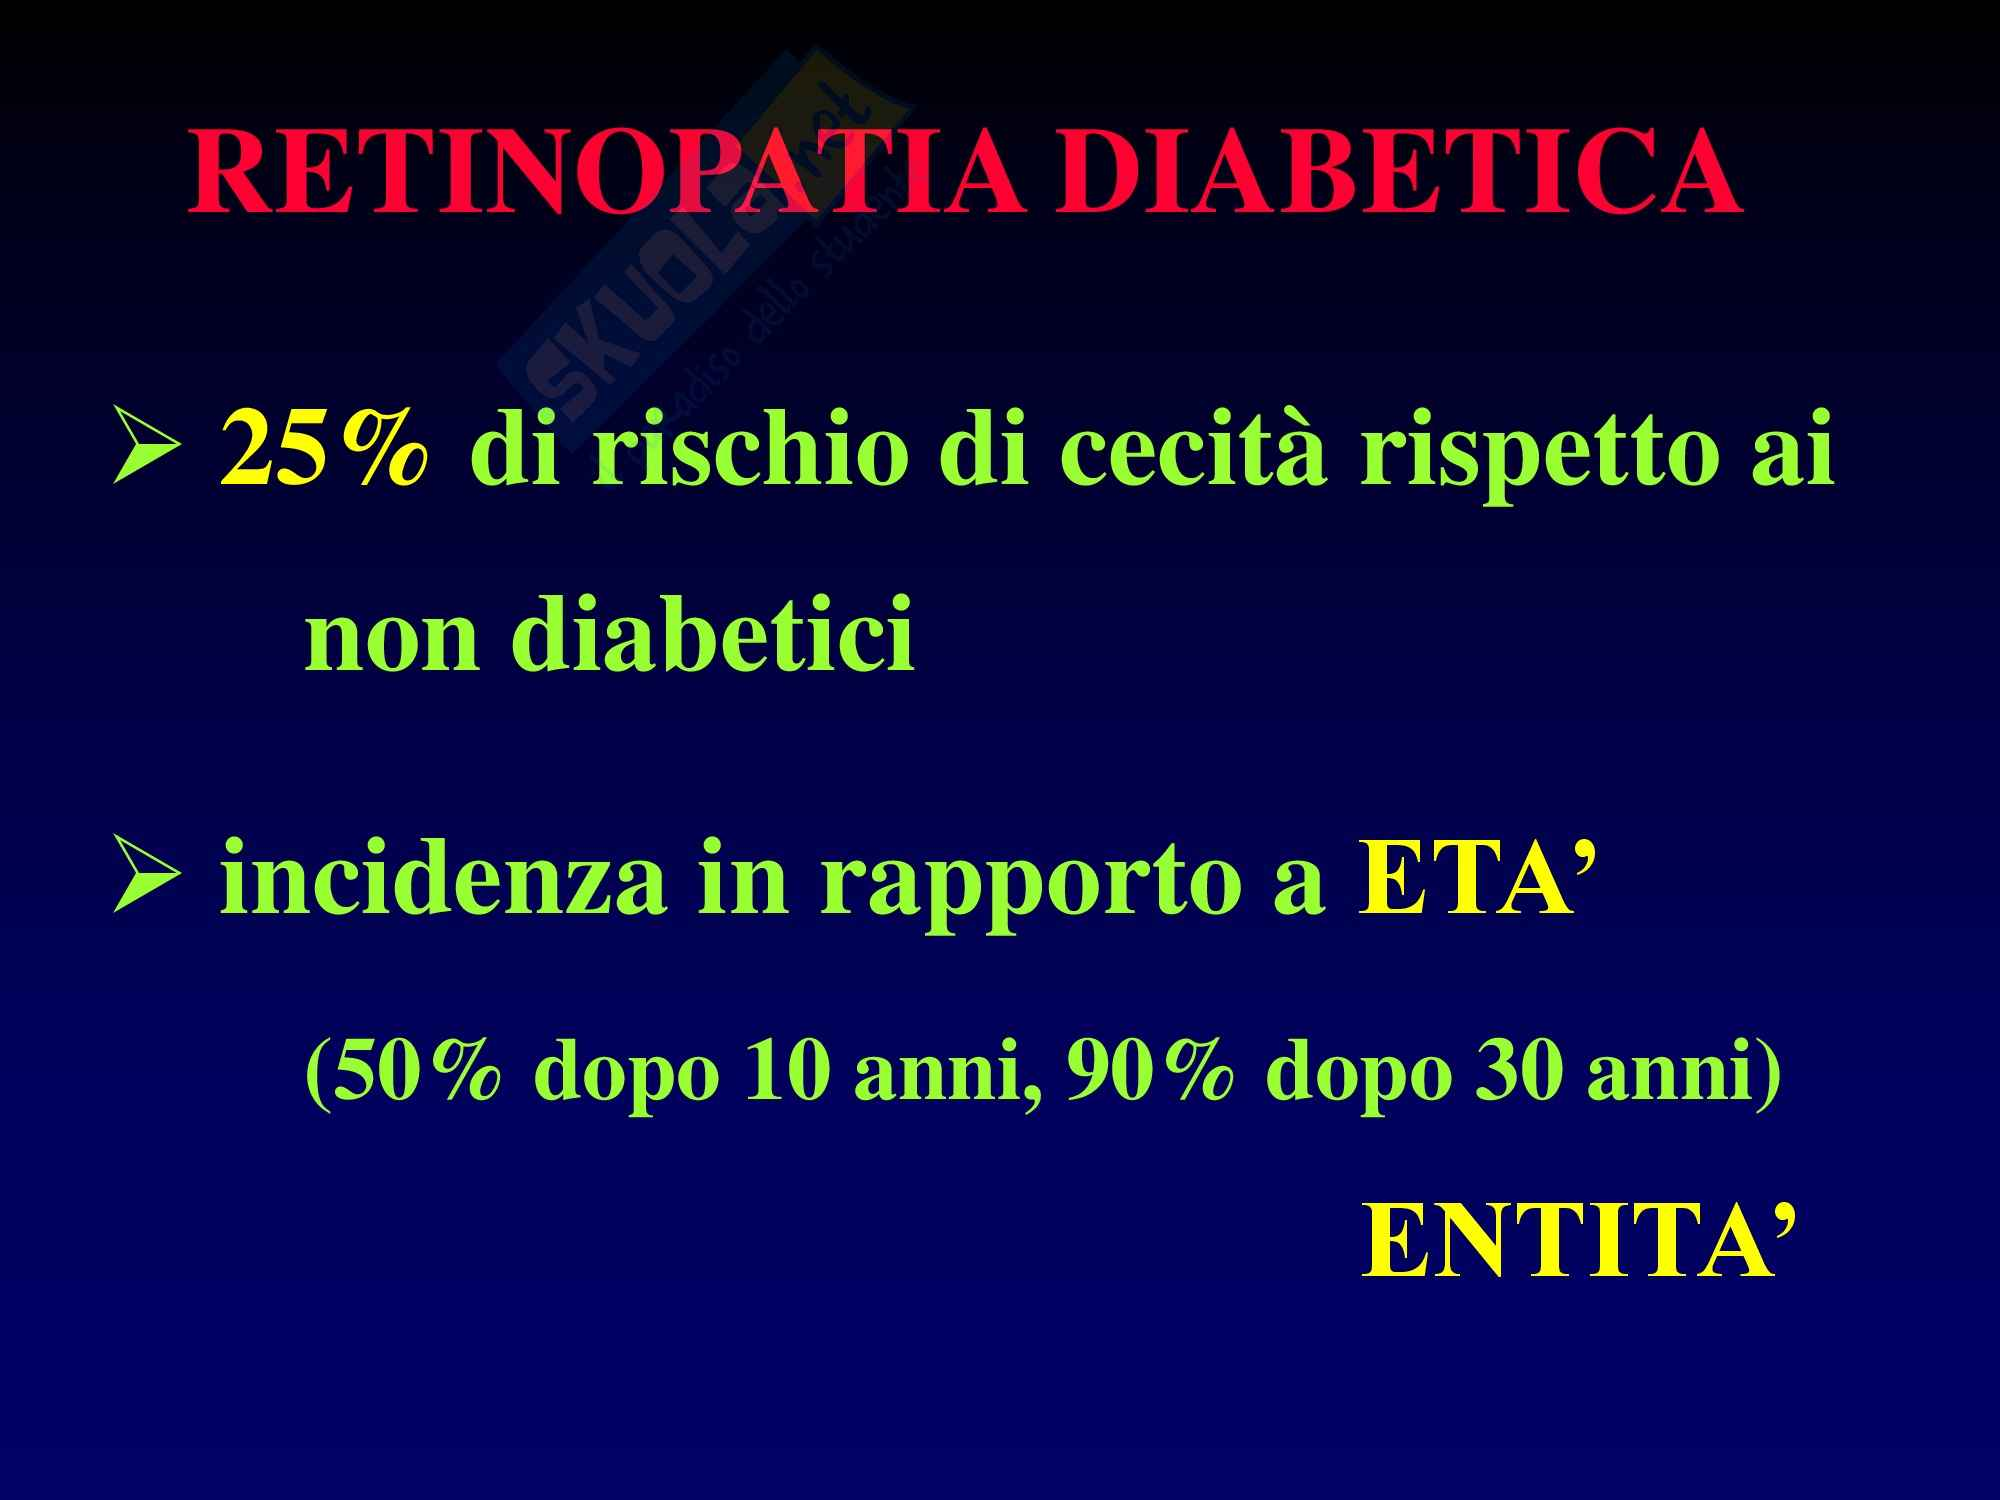 Retinopatia Diabetica e Ipertensiva